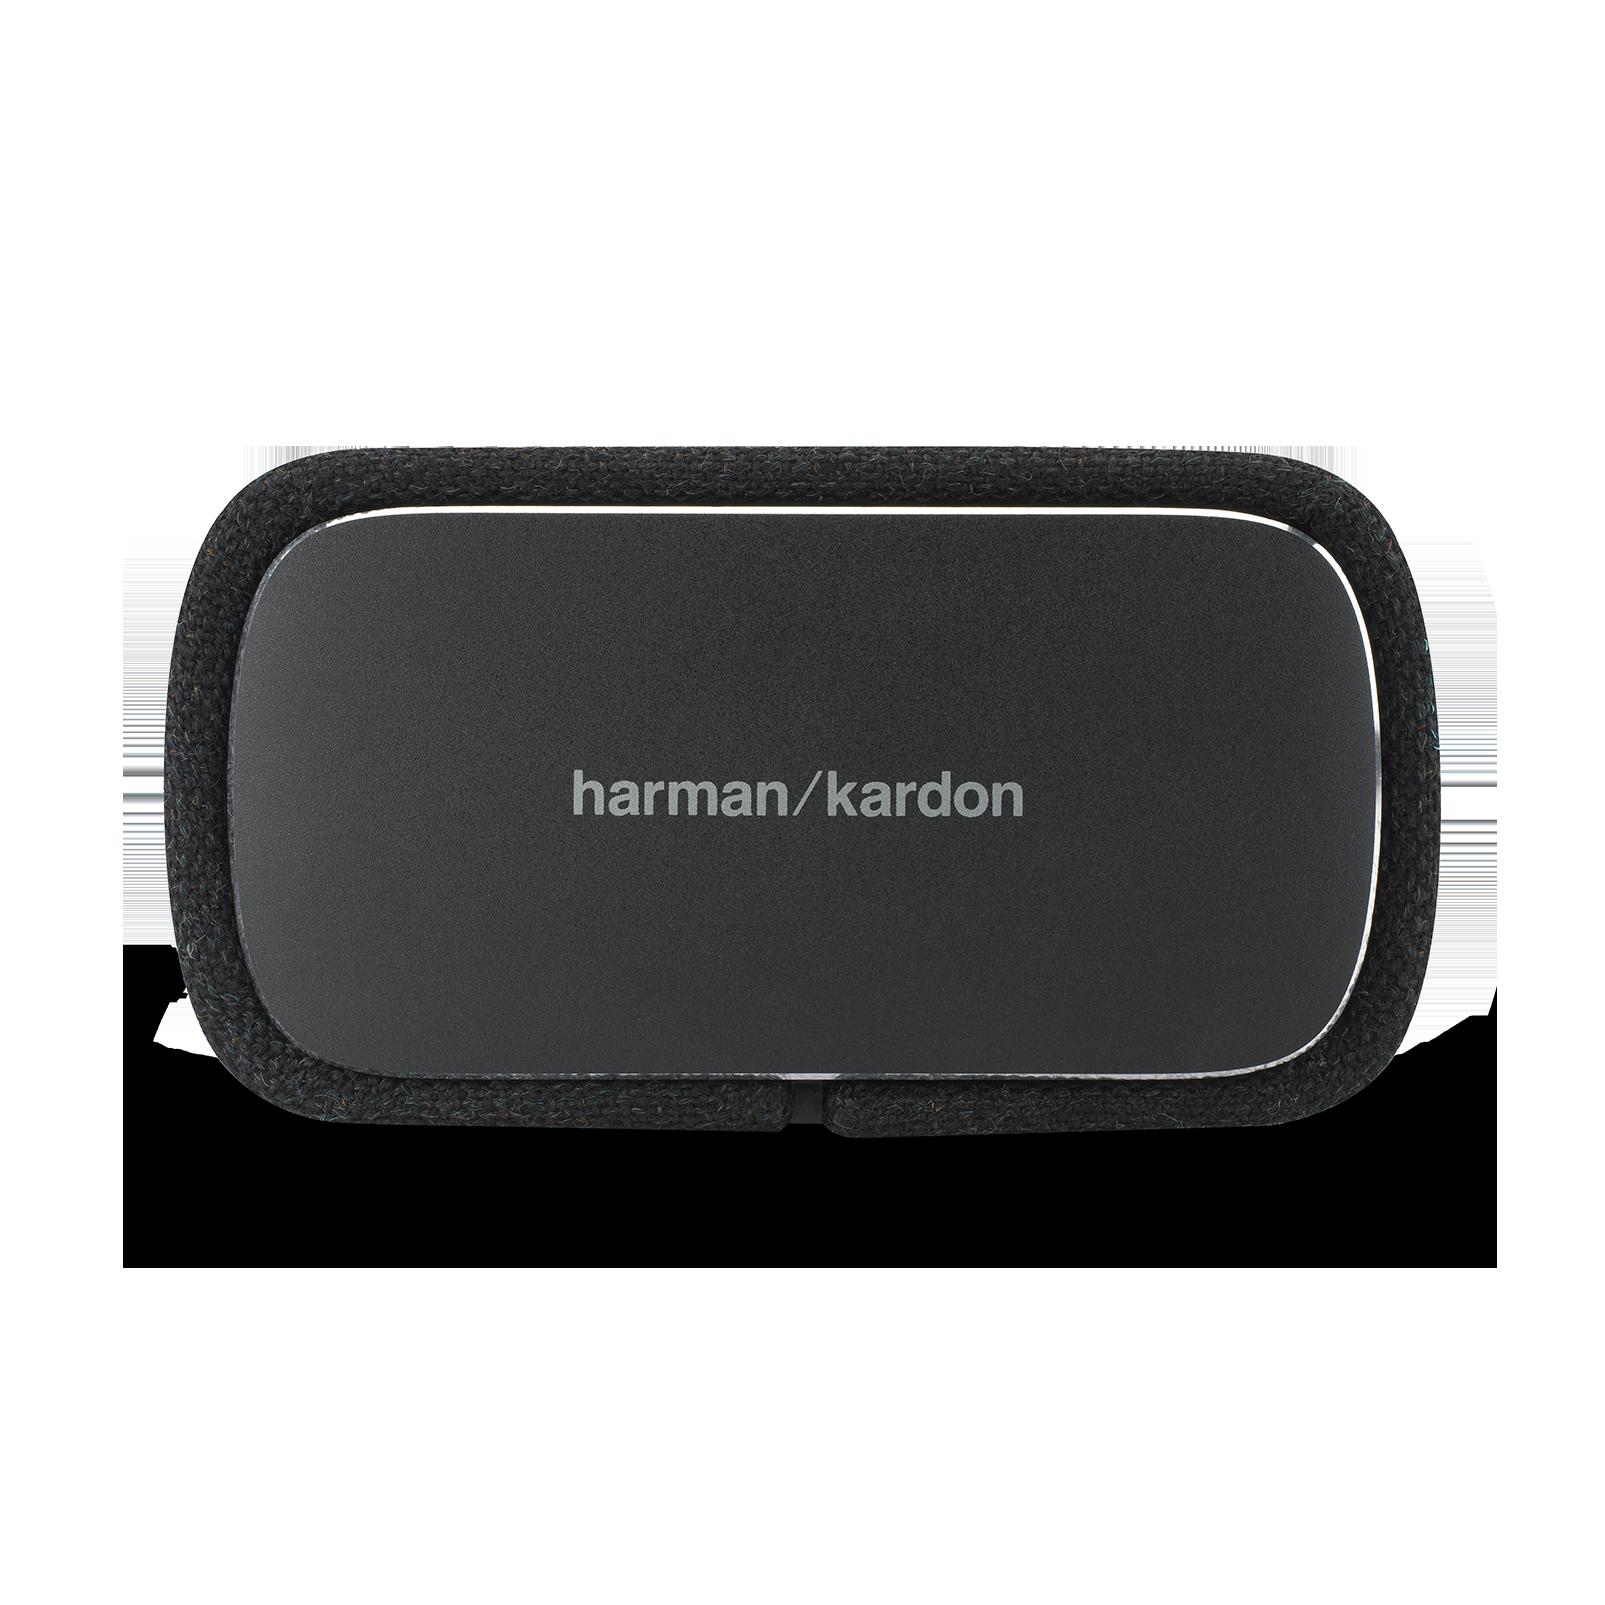 Harman Kardon Citation Bar - Black - The smartest soundbar for movies and music - Detailshot 3